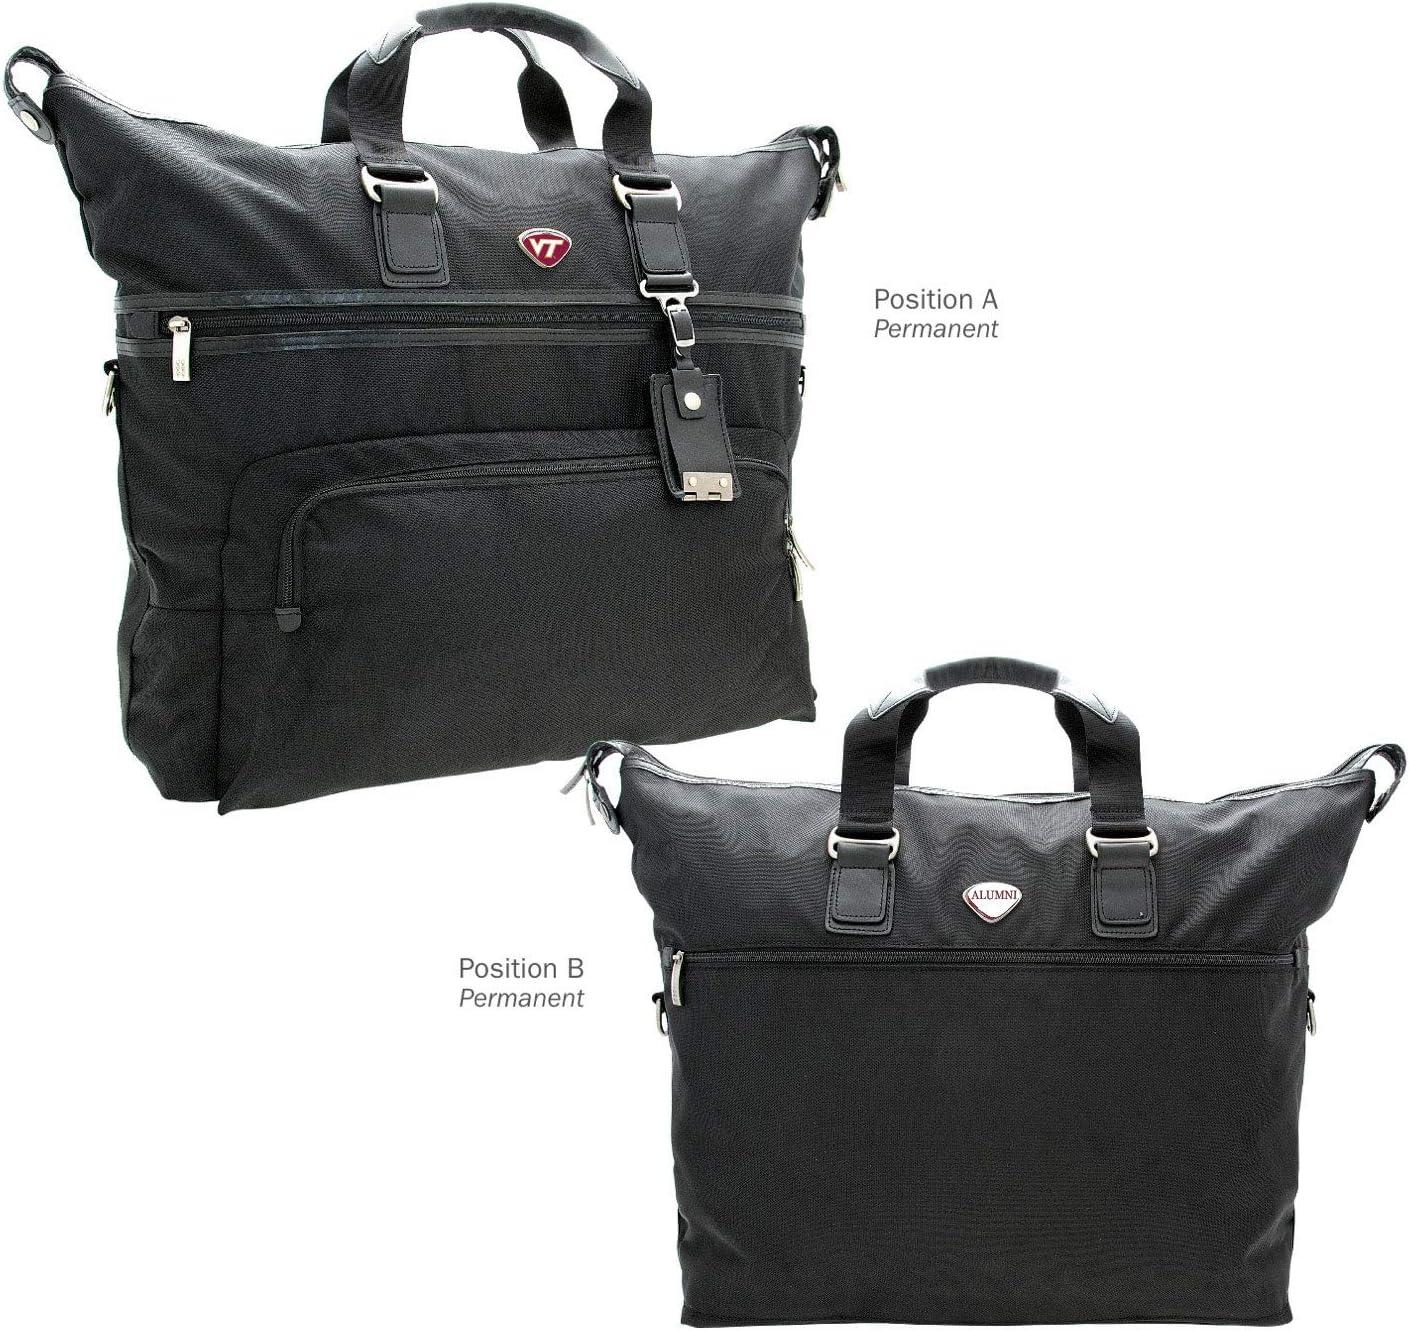 One Size Black AdSpec NCAA Virginia Tech Hokies Collegiate Executive Weekender Duffel BagCollegiate Executive Weekender Duffel Bag